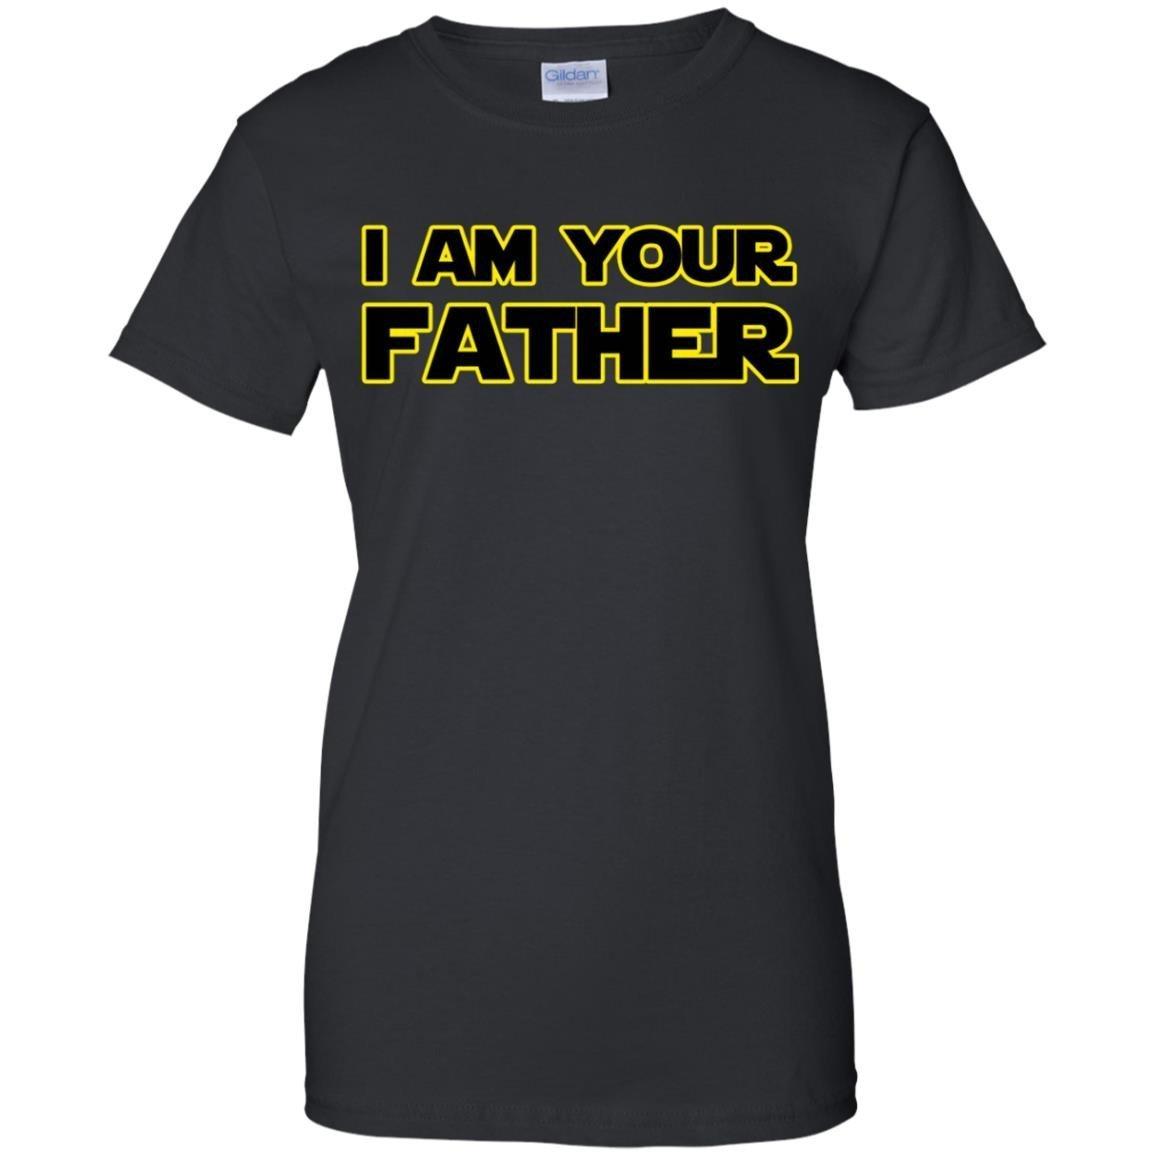 Your Father T-Shirt Women